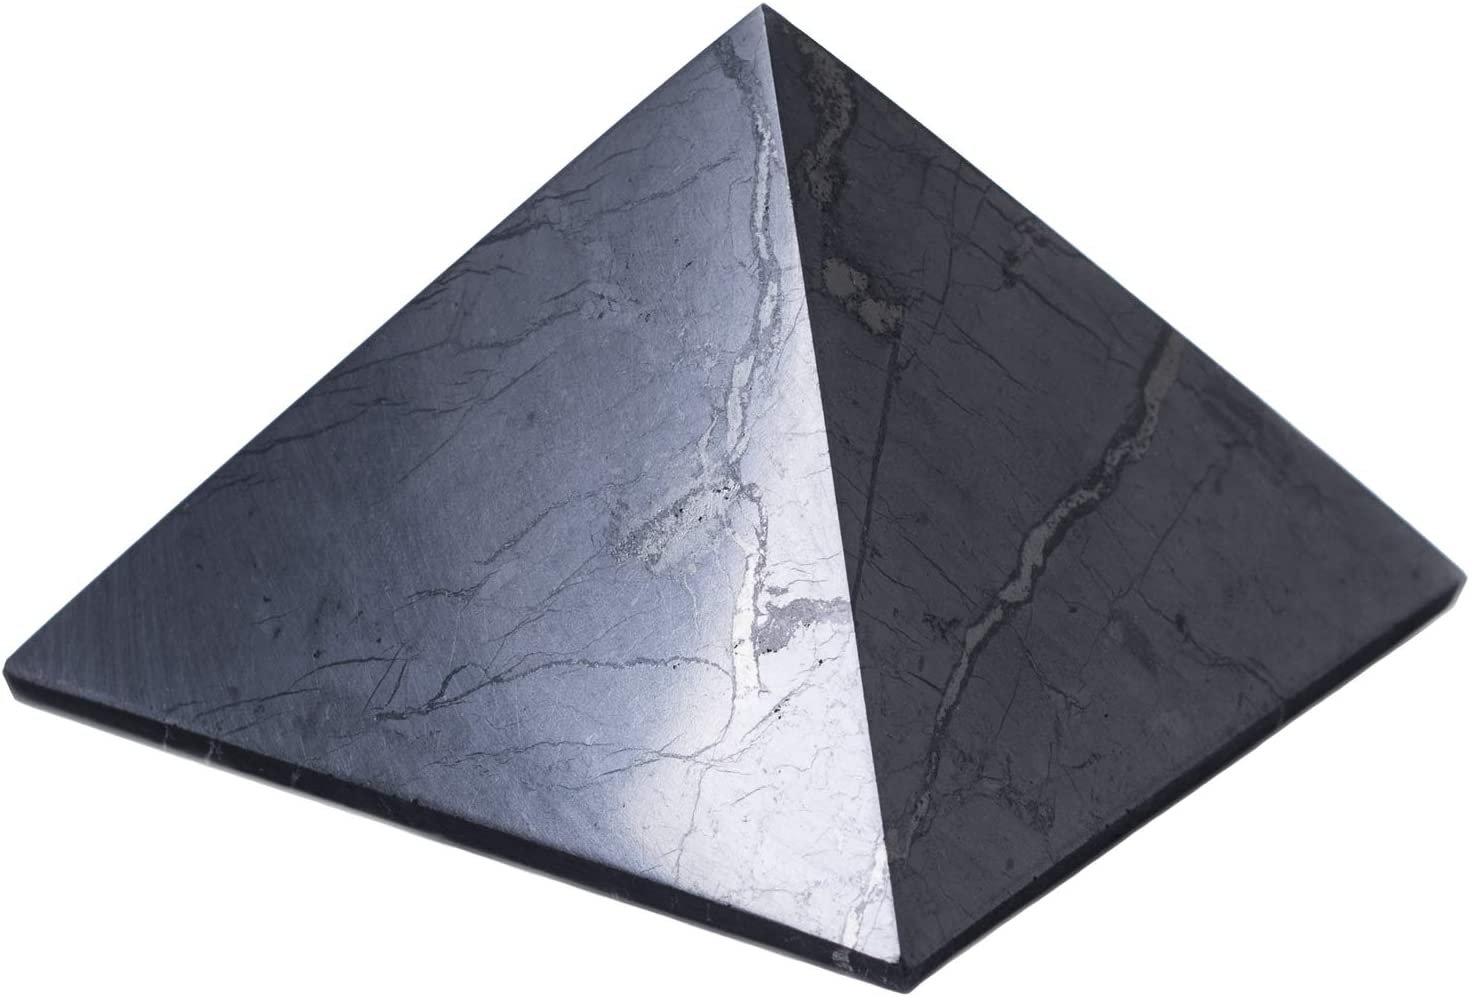 Keled Rocks Shungite Challenge the lowest price of Japan ☆ unisex Pyramid 4